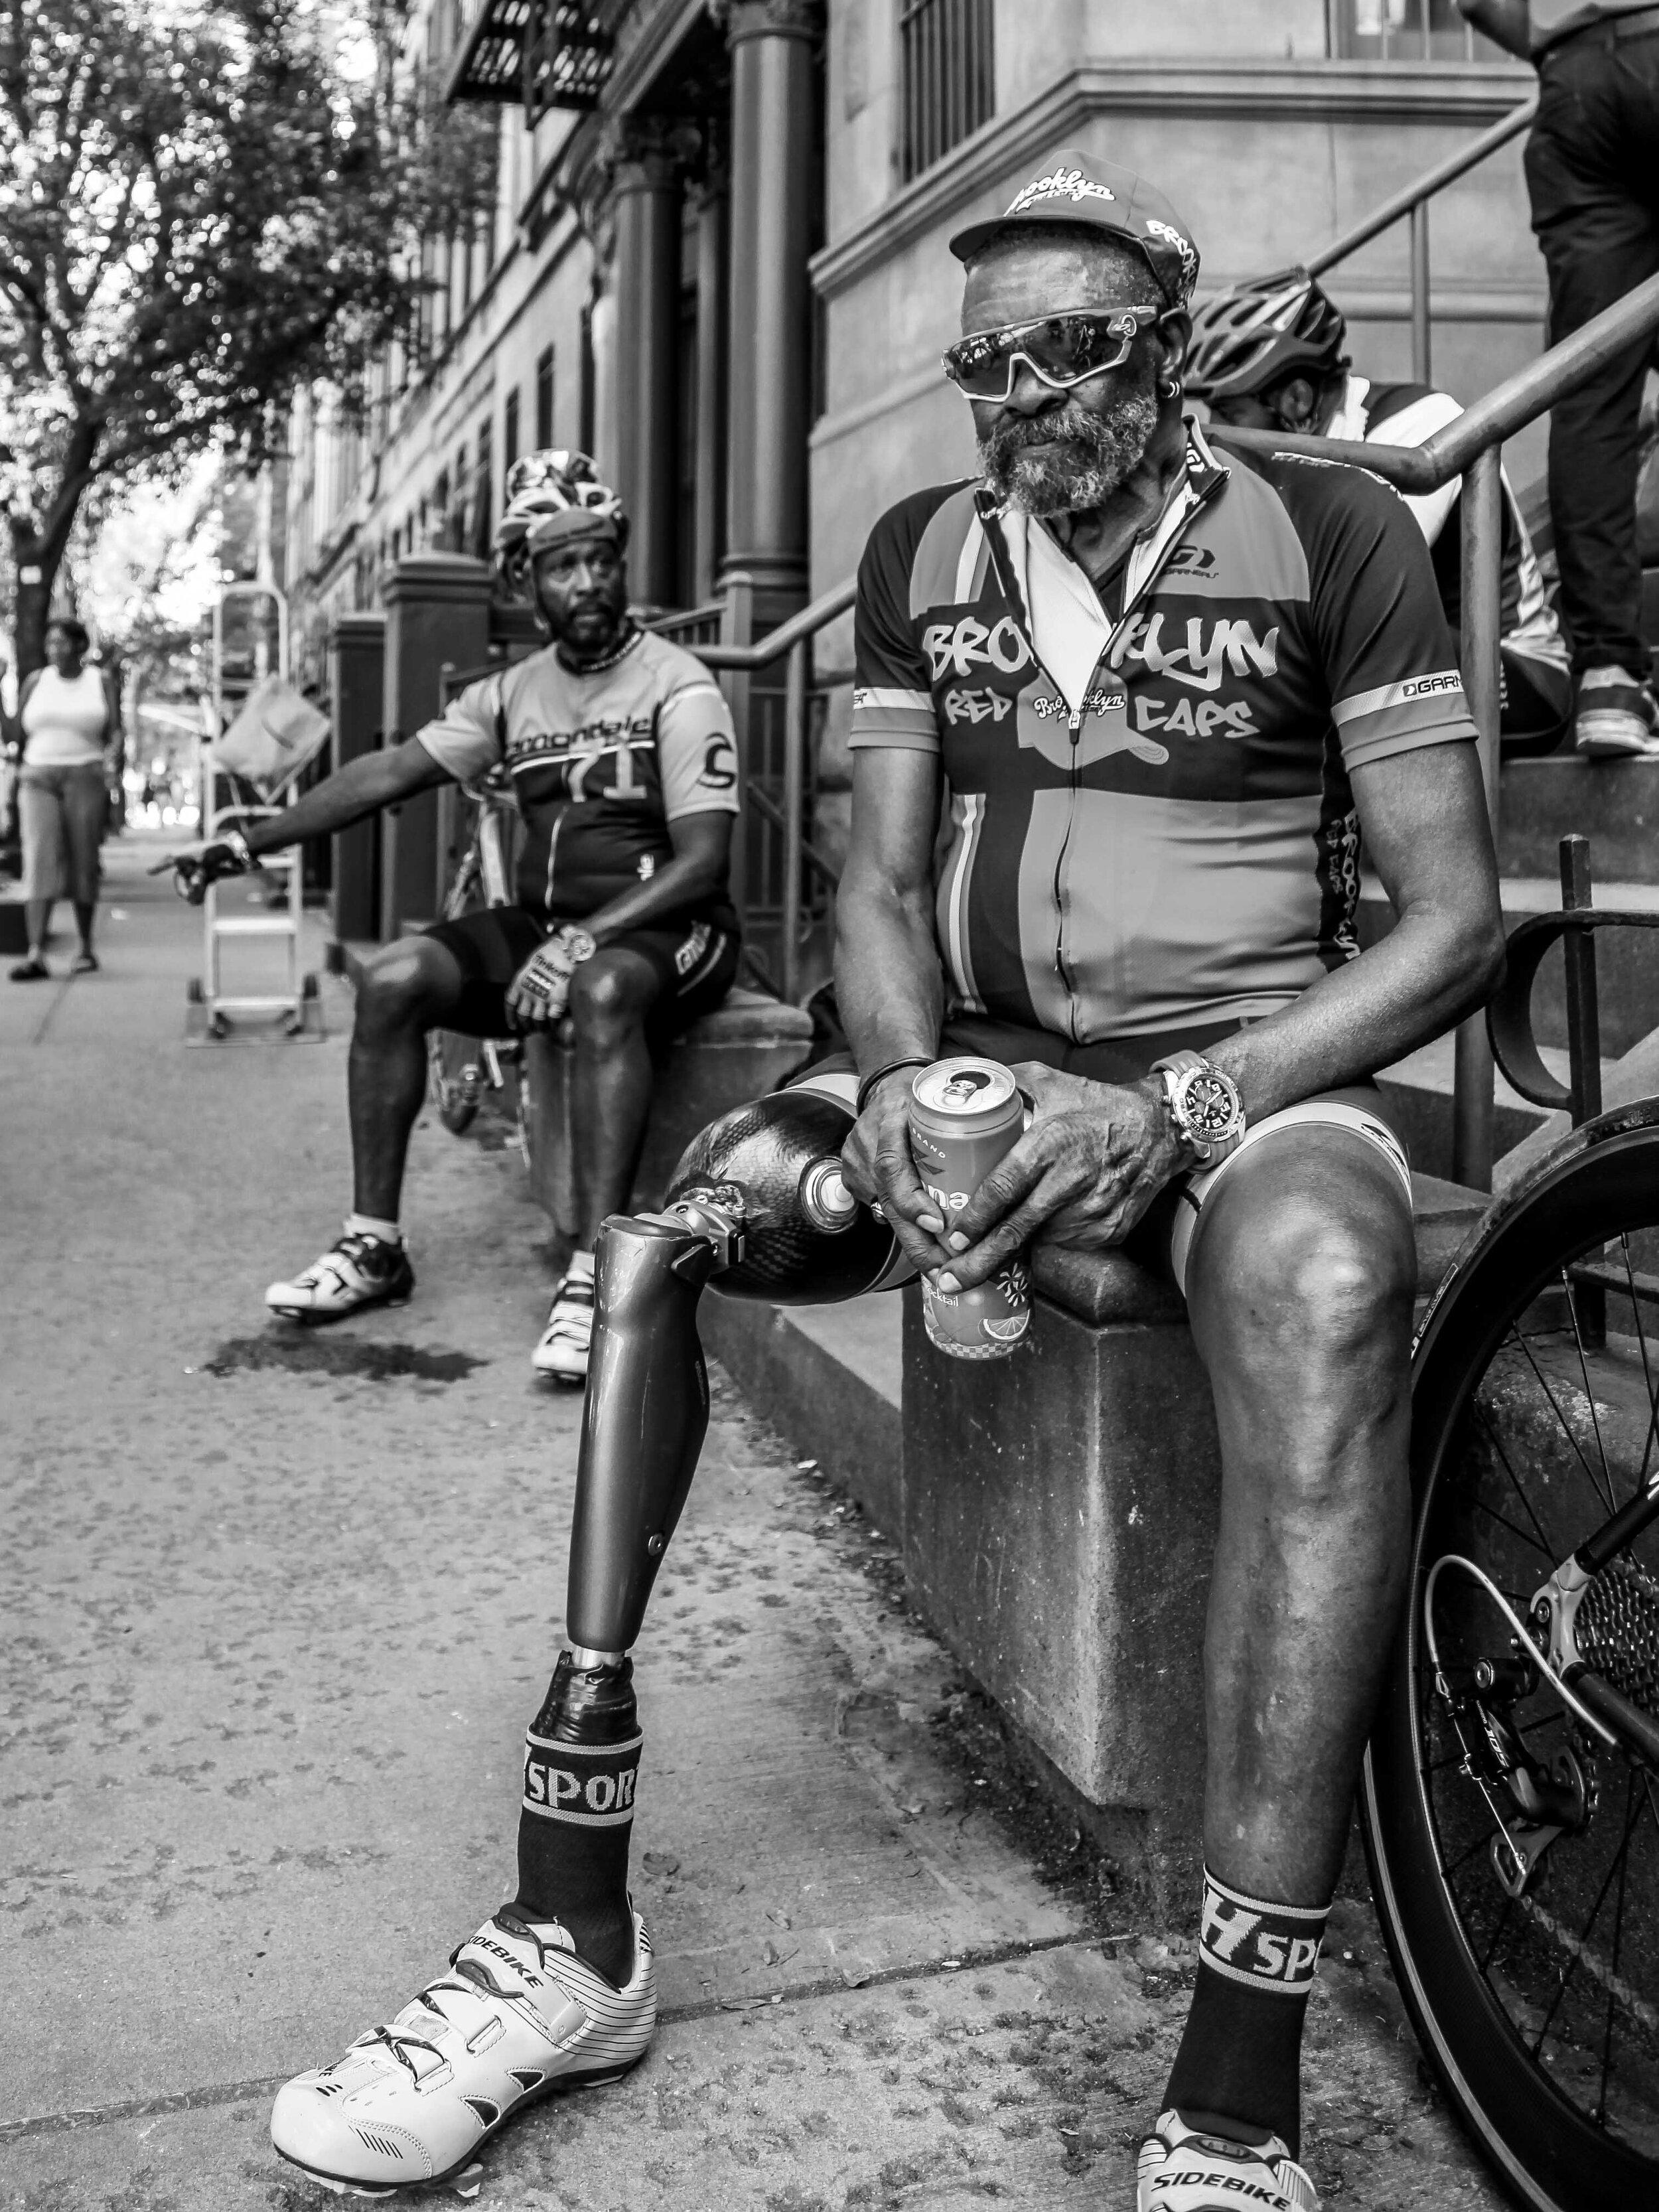 Harlem_Spectator_by_Wouter_Hoogenboom_BRP.jpg